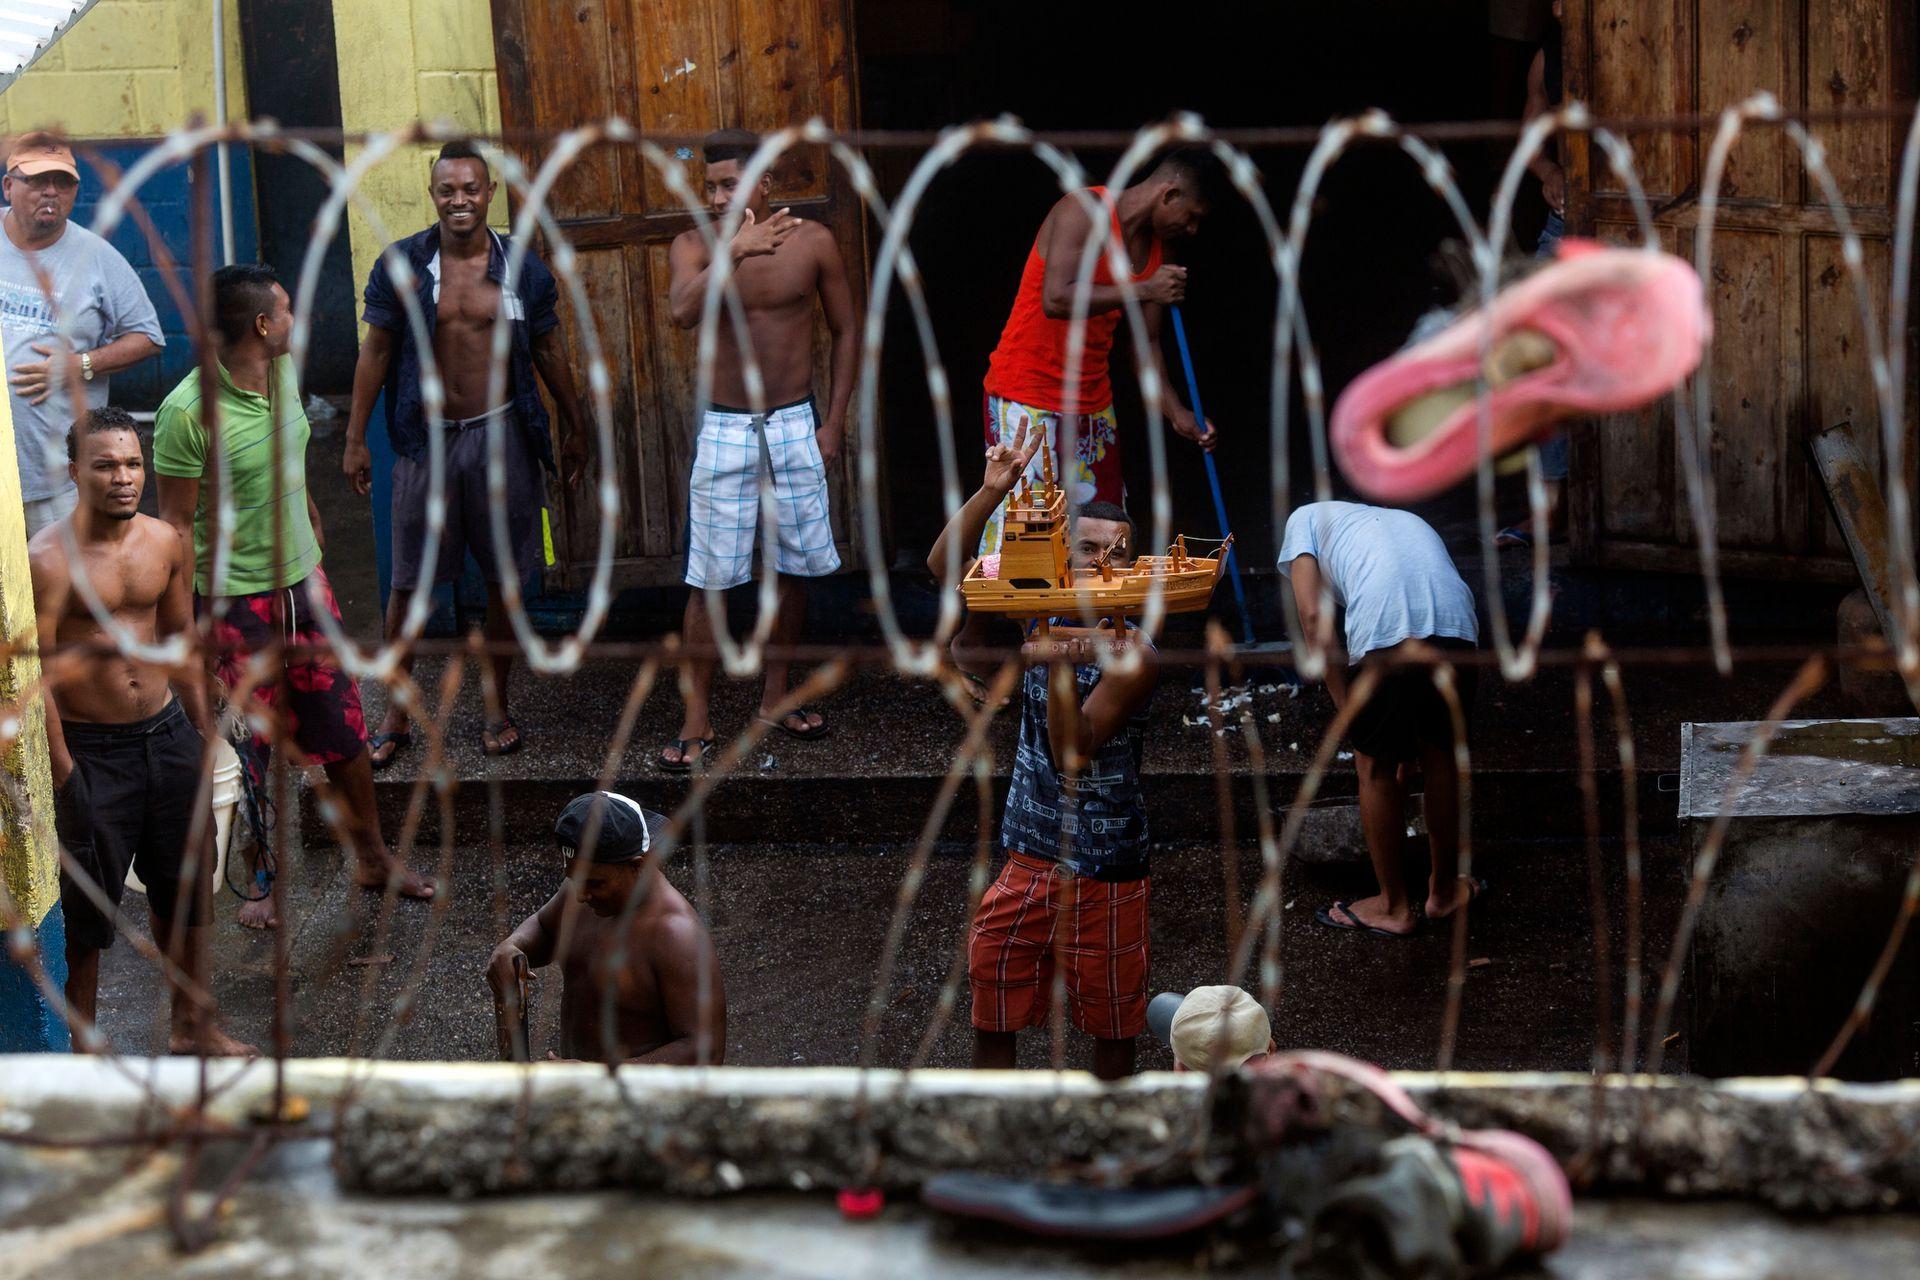 Un preso trata de vender un pequeño barco de madera